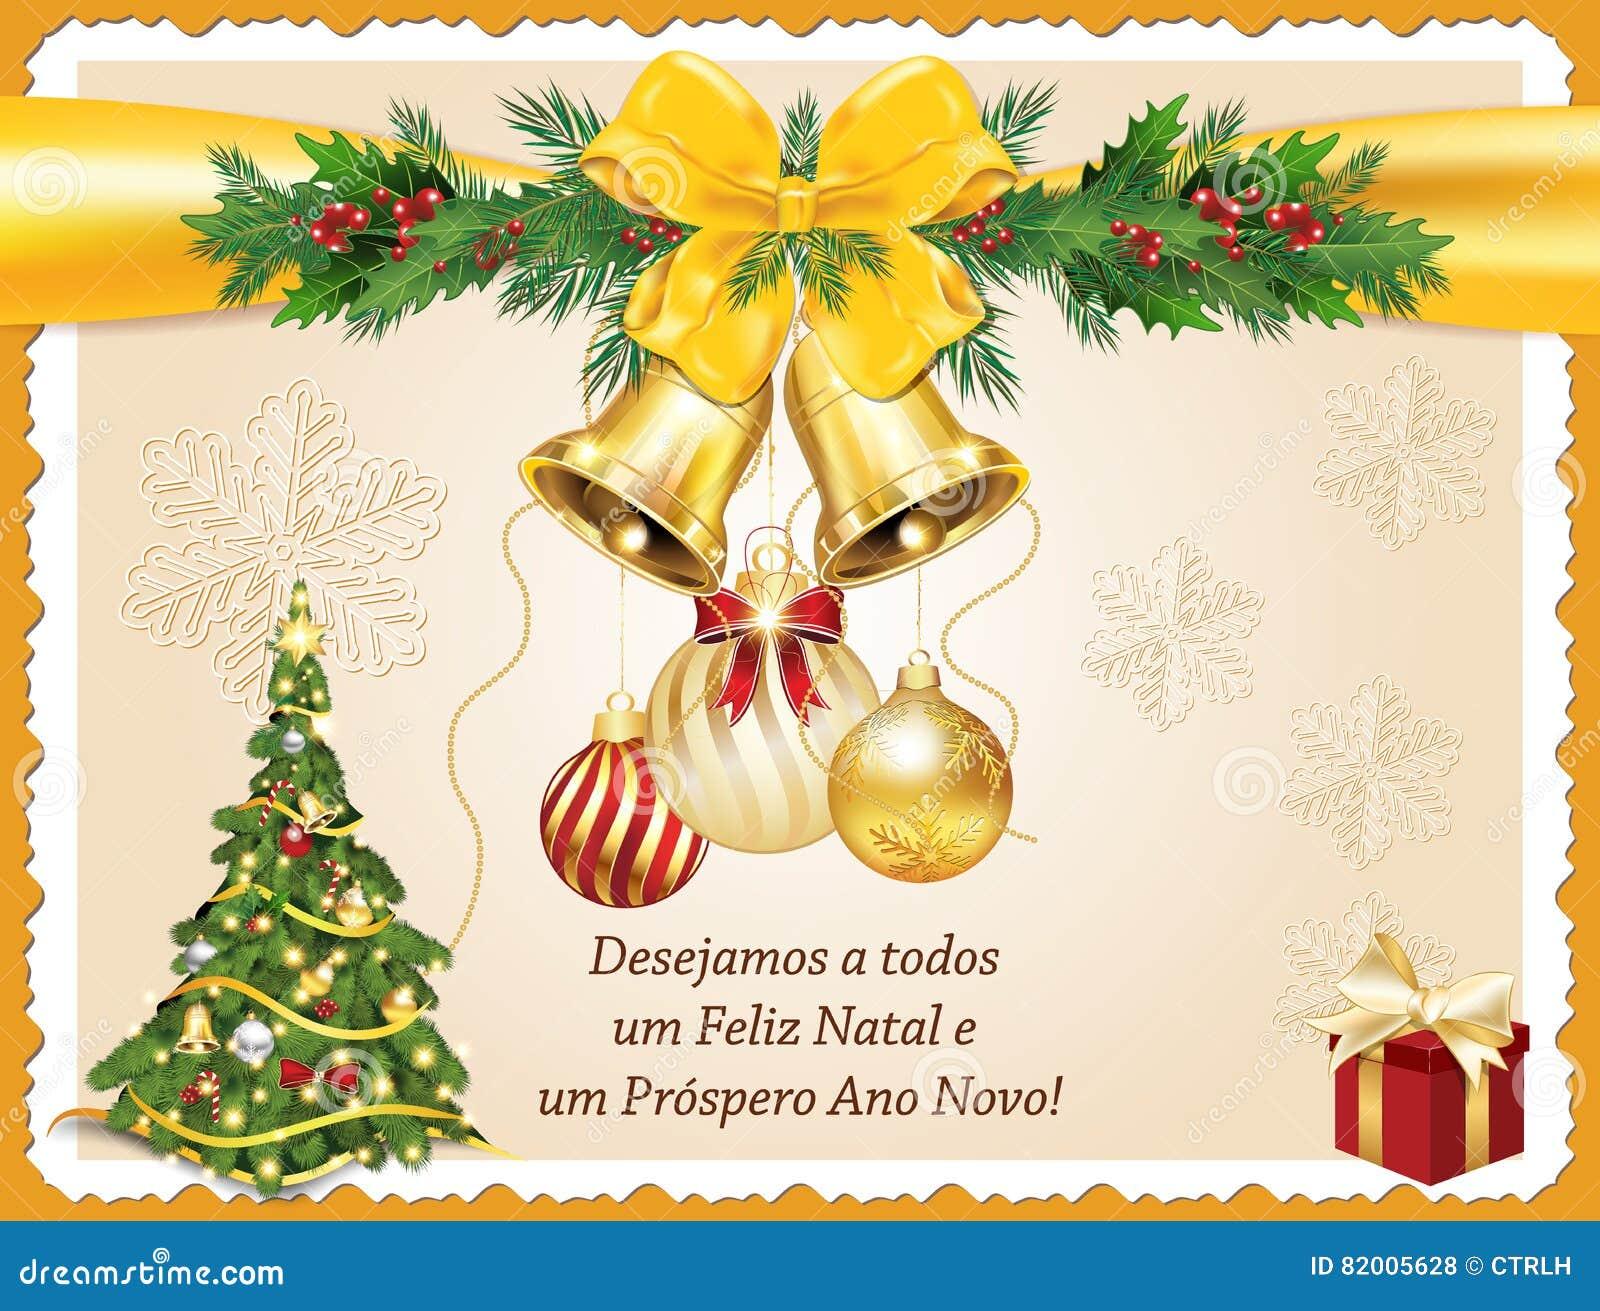 Portuguese Seasons Greetings Stock Illustration Illustration Of